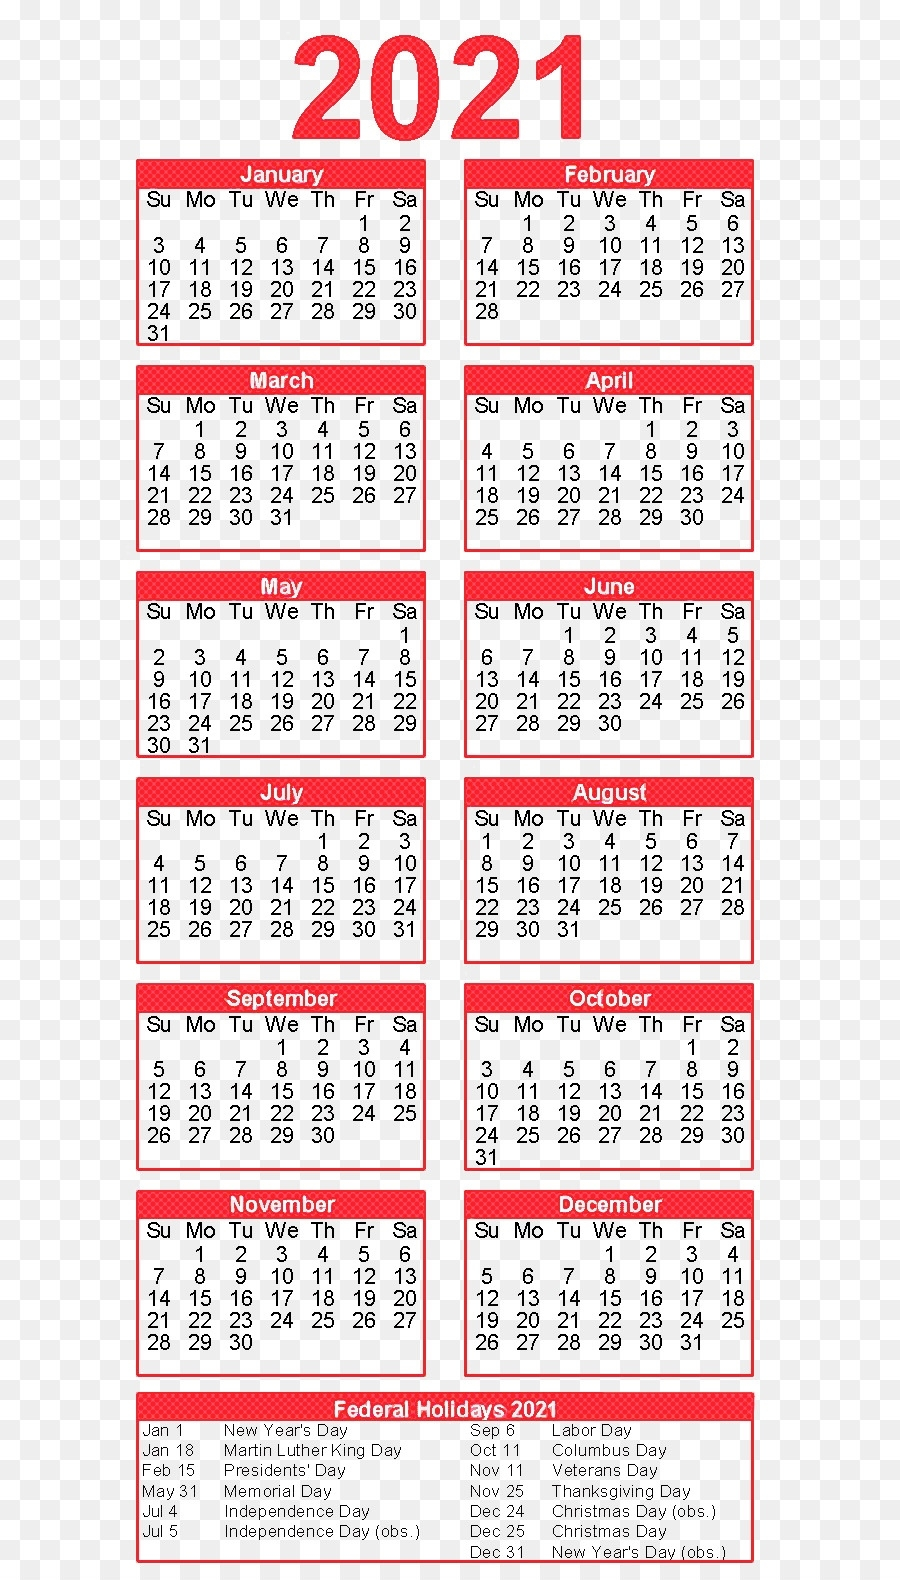 Calendar System 2021 Calendar Year 2020 2019 Png Download - 741*1578 - Free Transparent Calendar 25 June 2021 Islamic Calendar